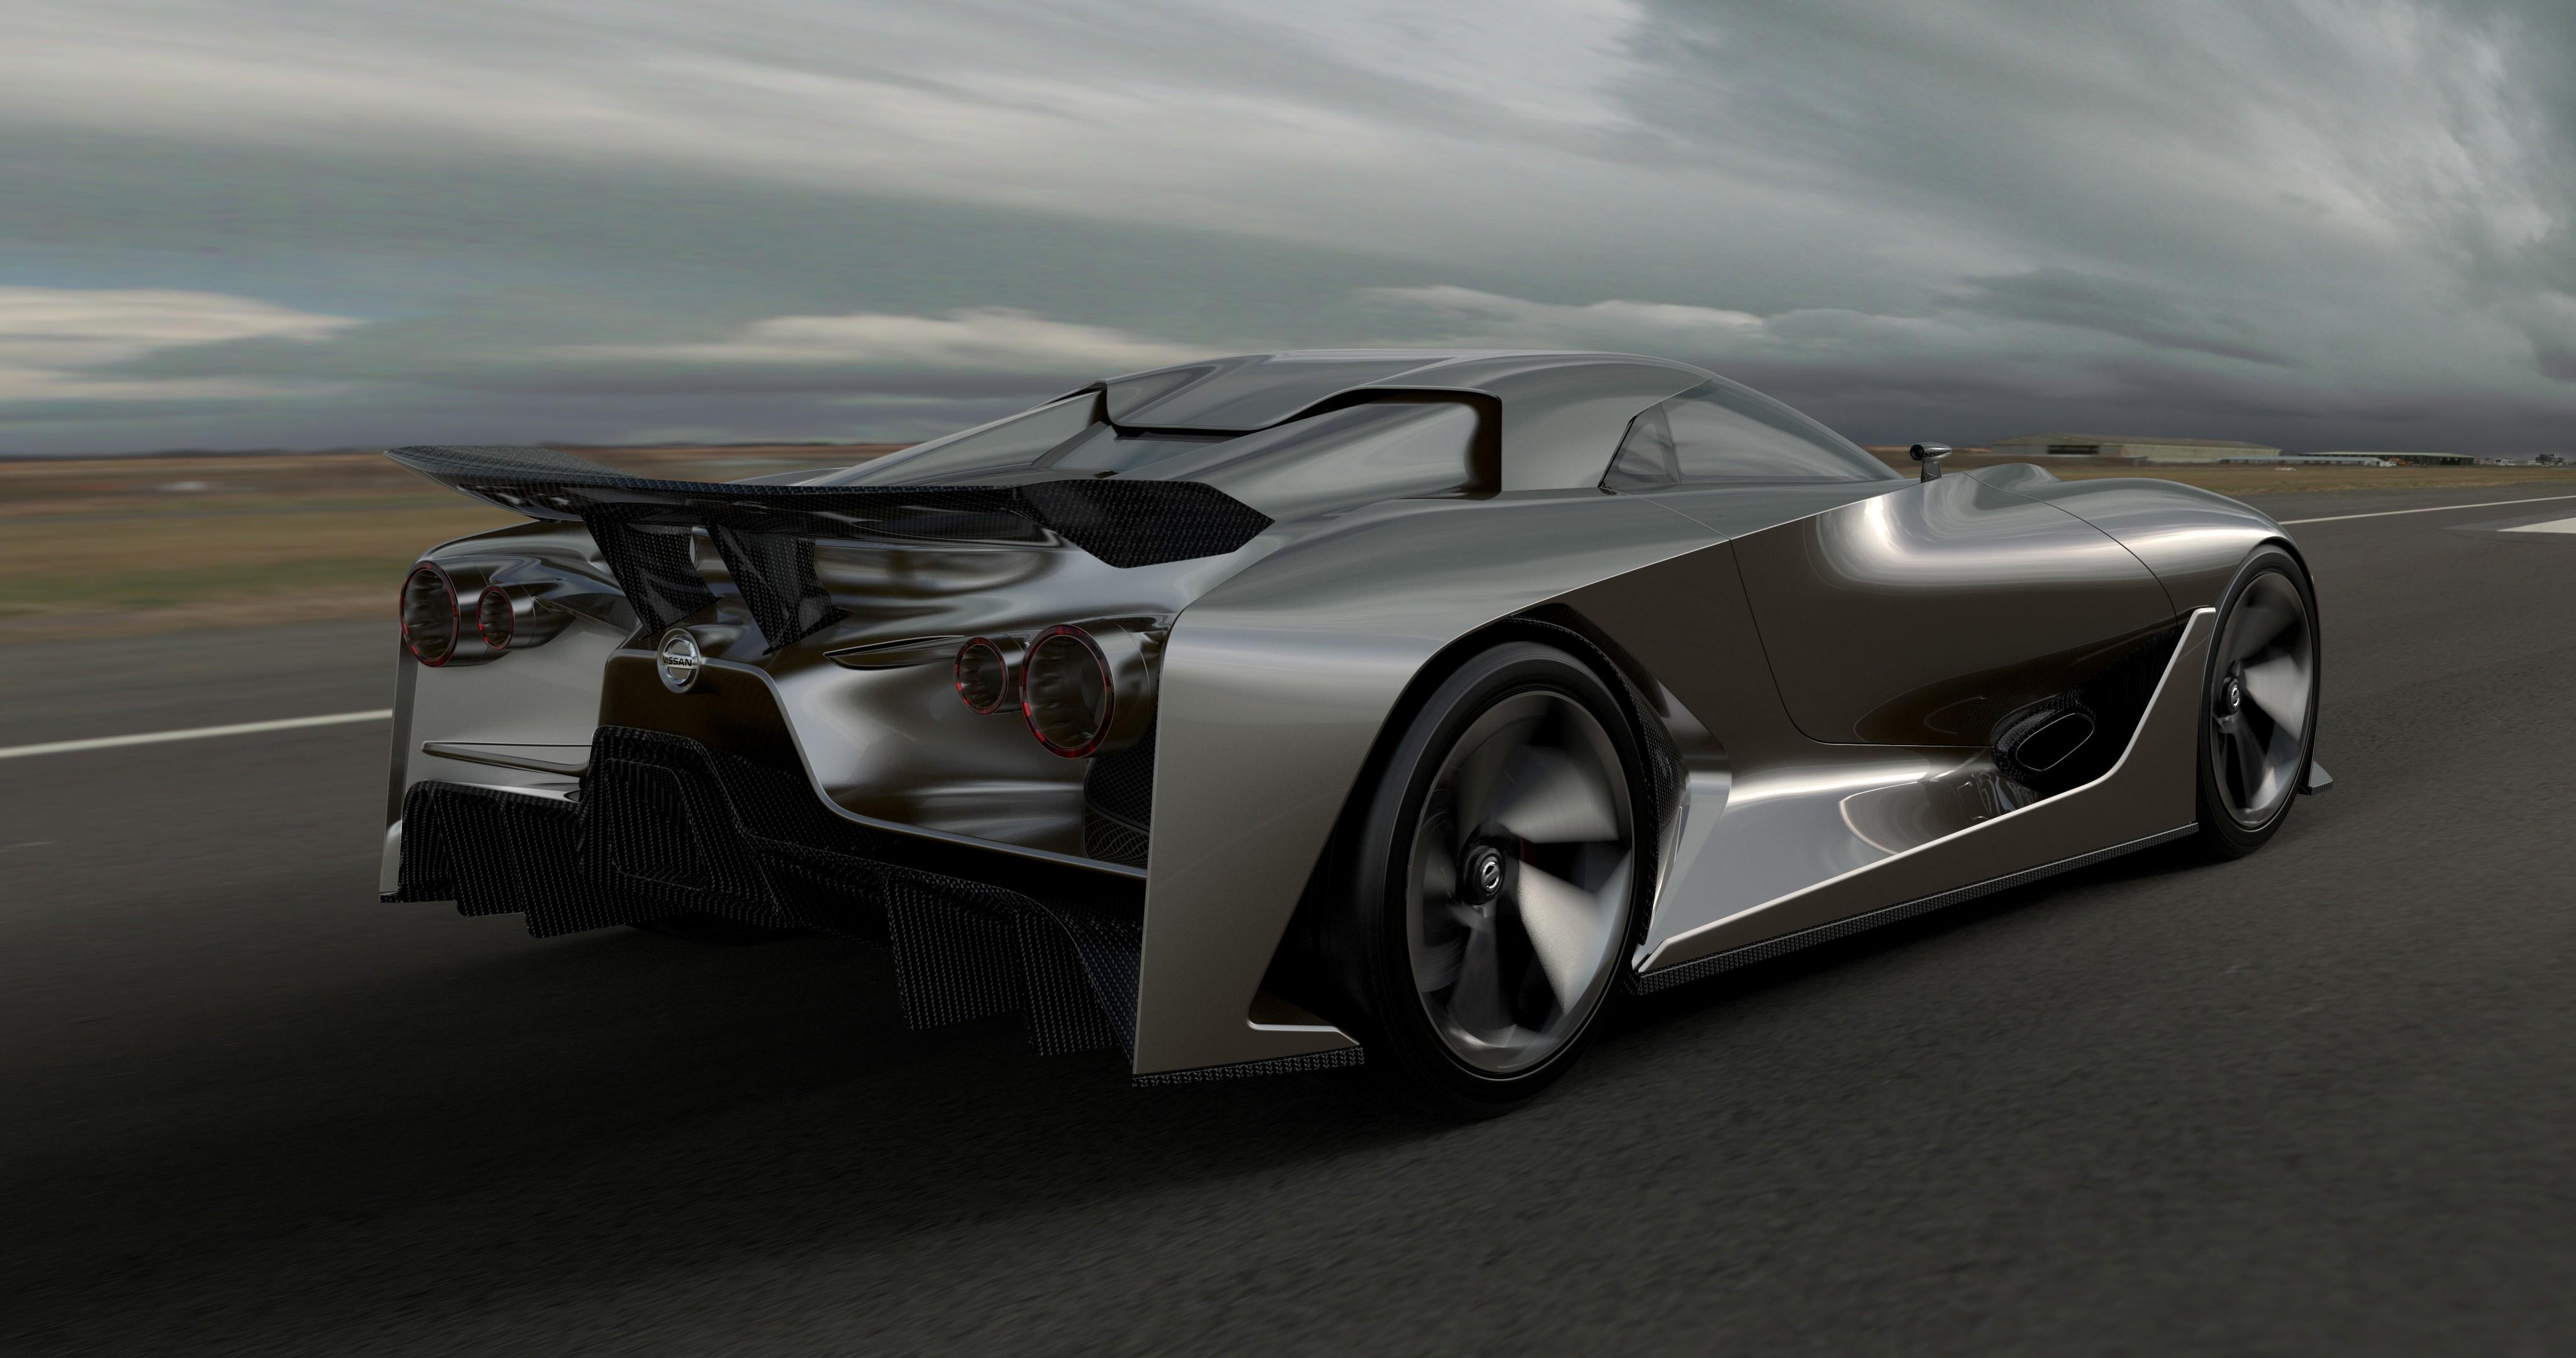 Wallpaper Nissan Sports Car Performance Car Koenigsegg Ccr